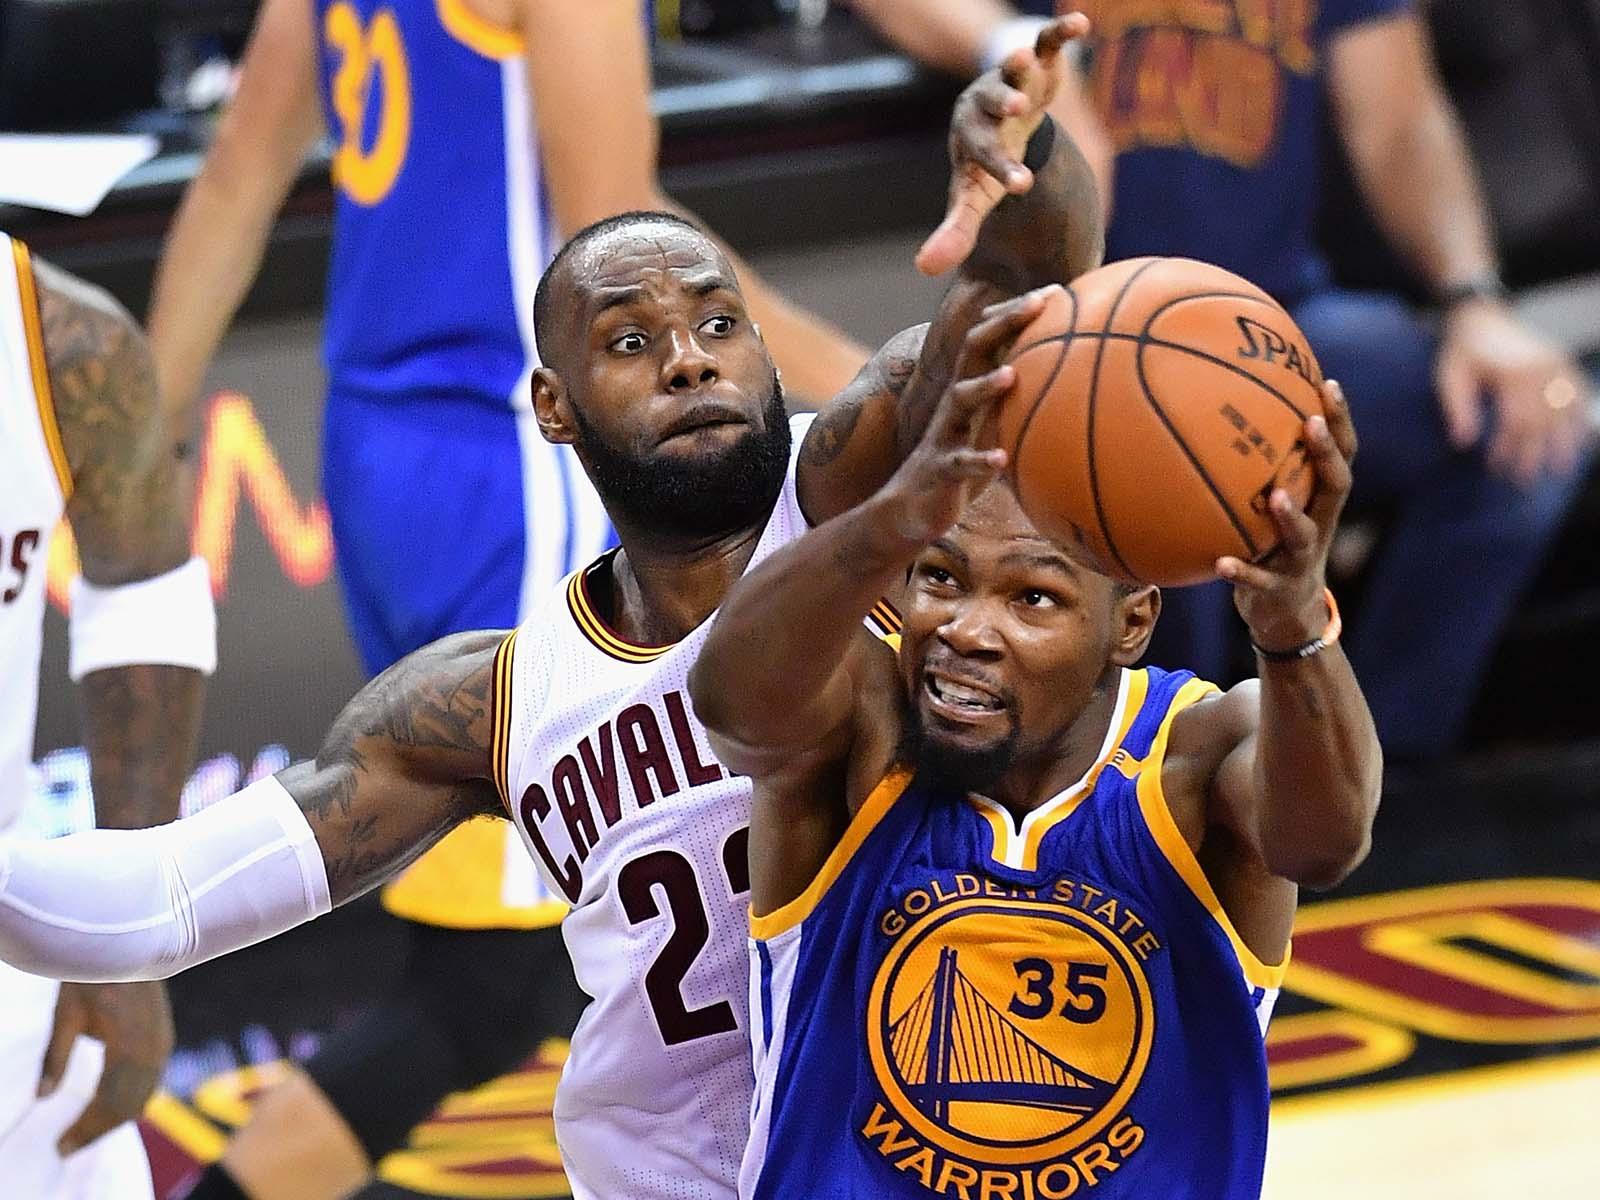 Nba Nba Players Basketball: Top 100 NBA Players Of 2018: LeBron Or Durant At No. 1